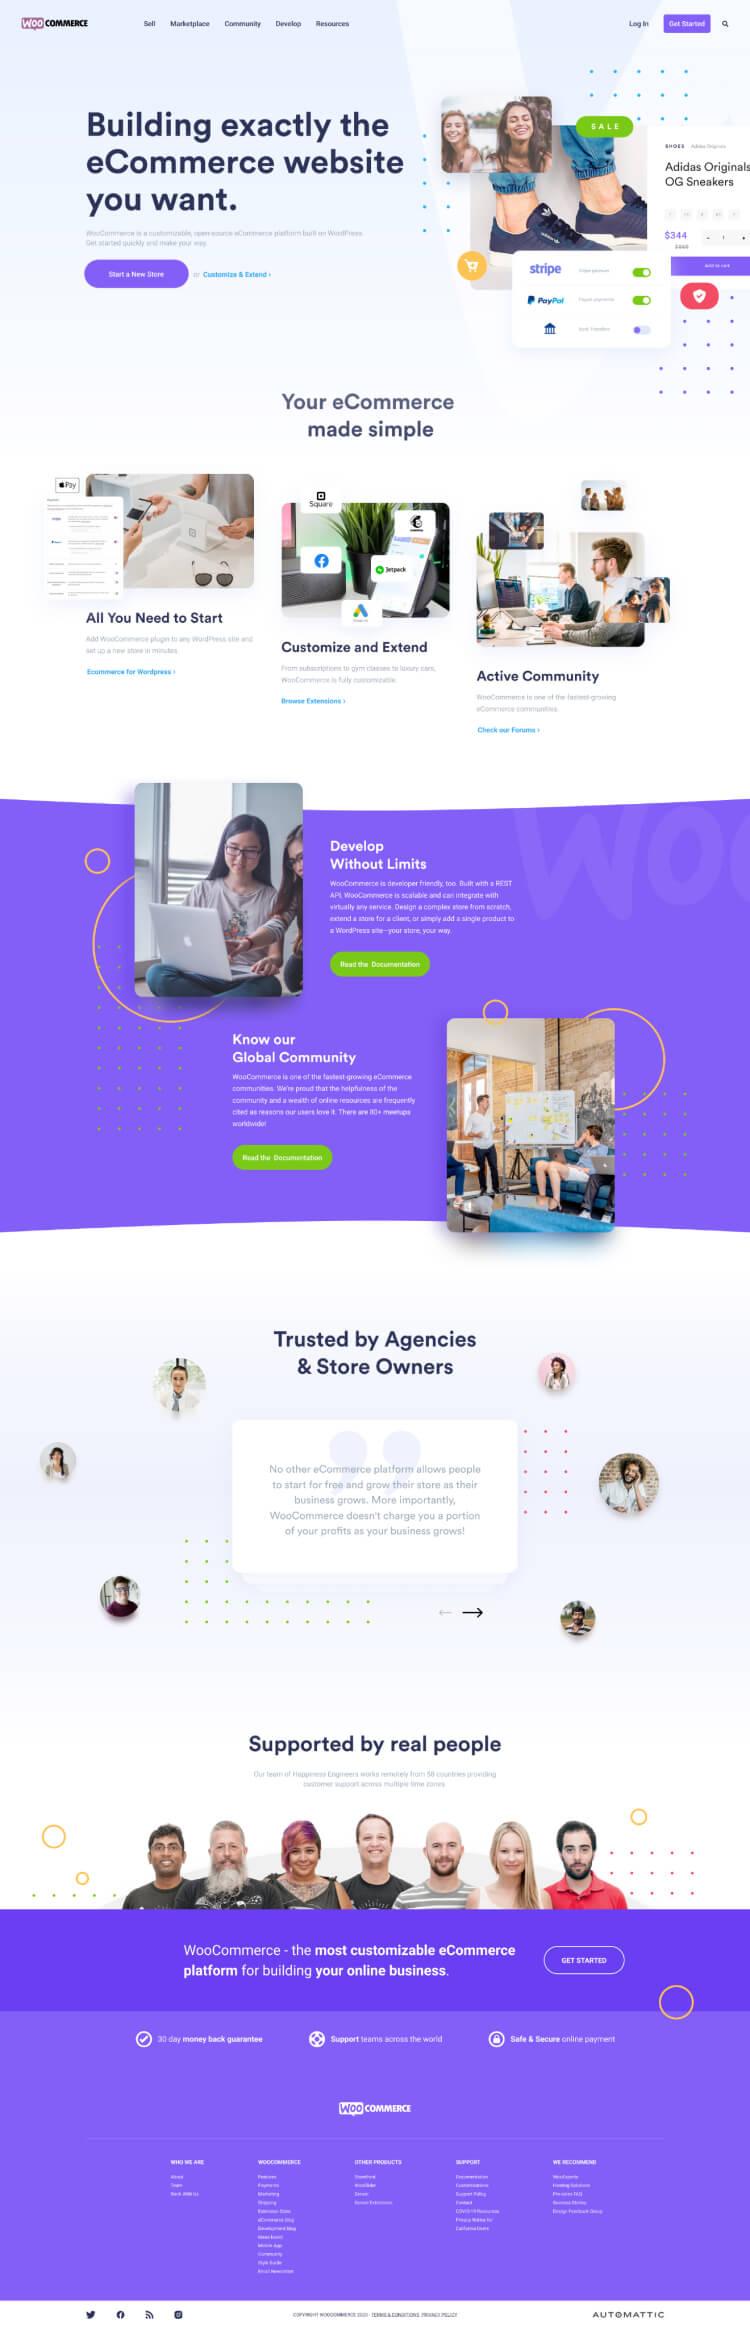 woocommerce landing page redesign free 3 - UI Freebies